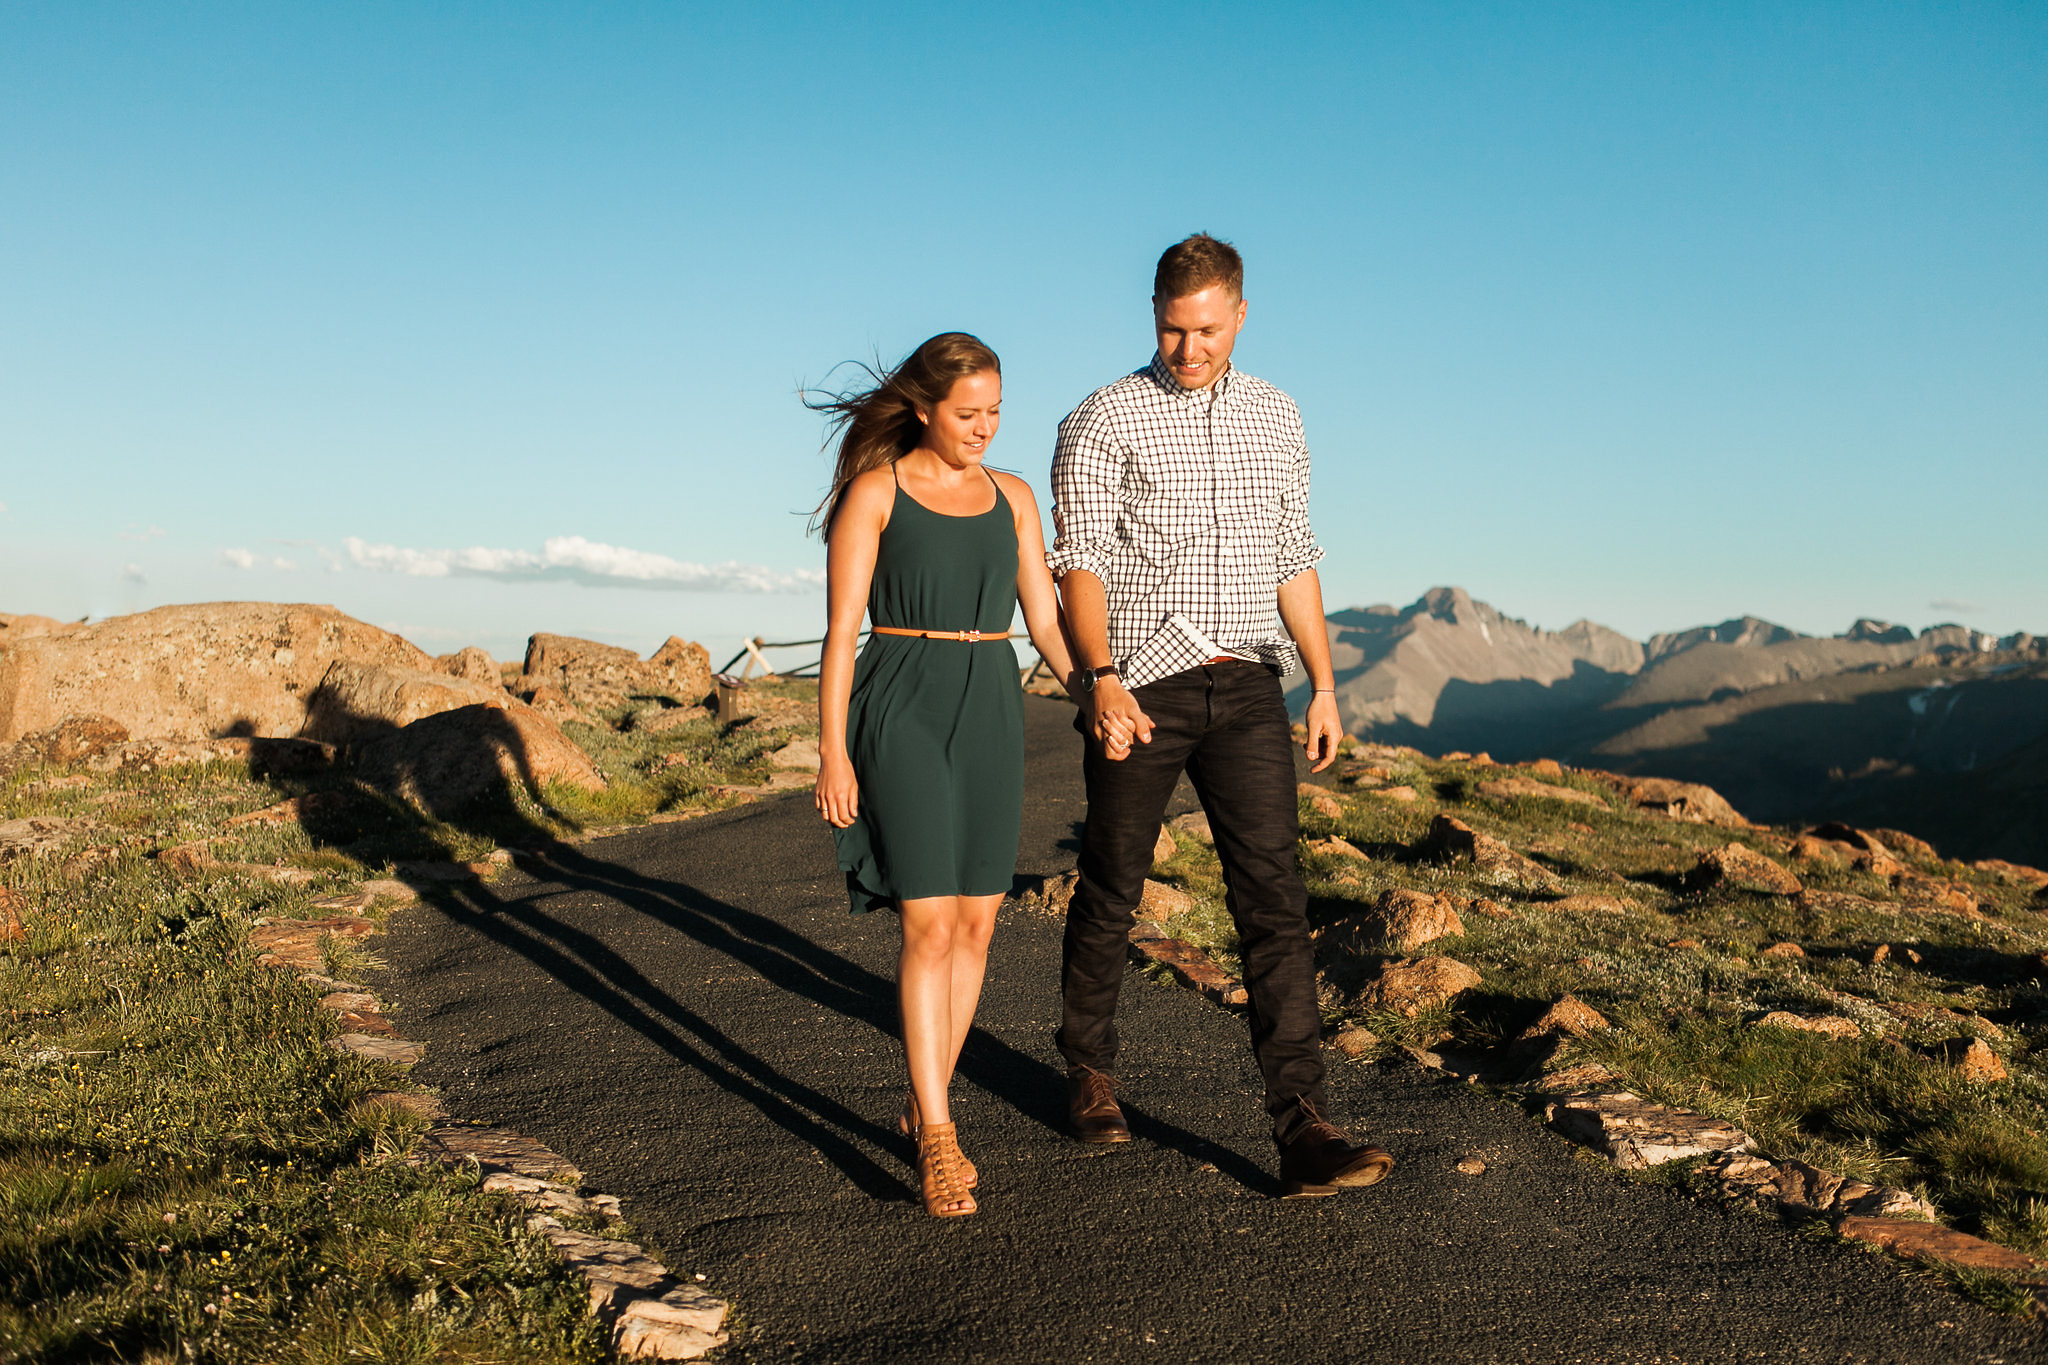 Rocky-Mountain-National-Park-engagement_031.jpg